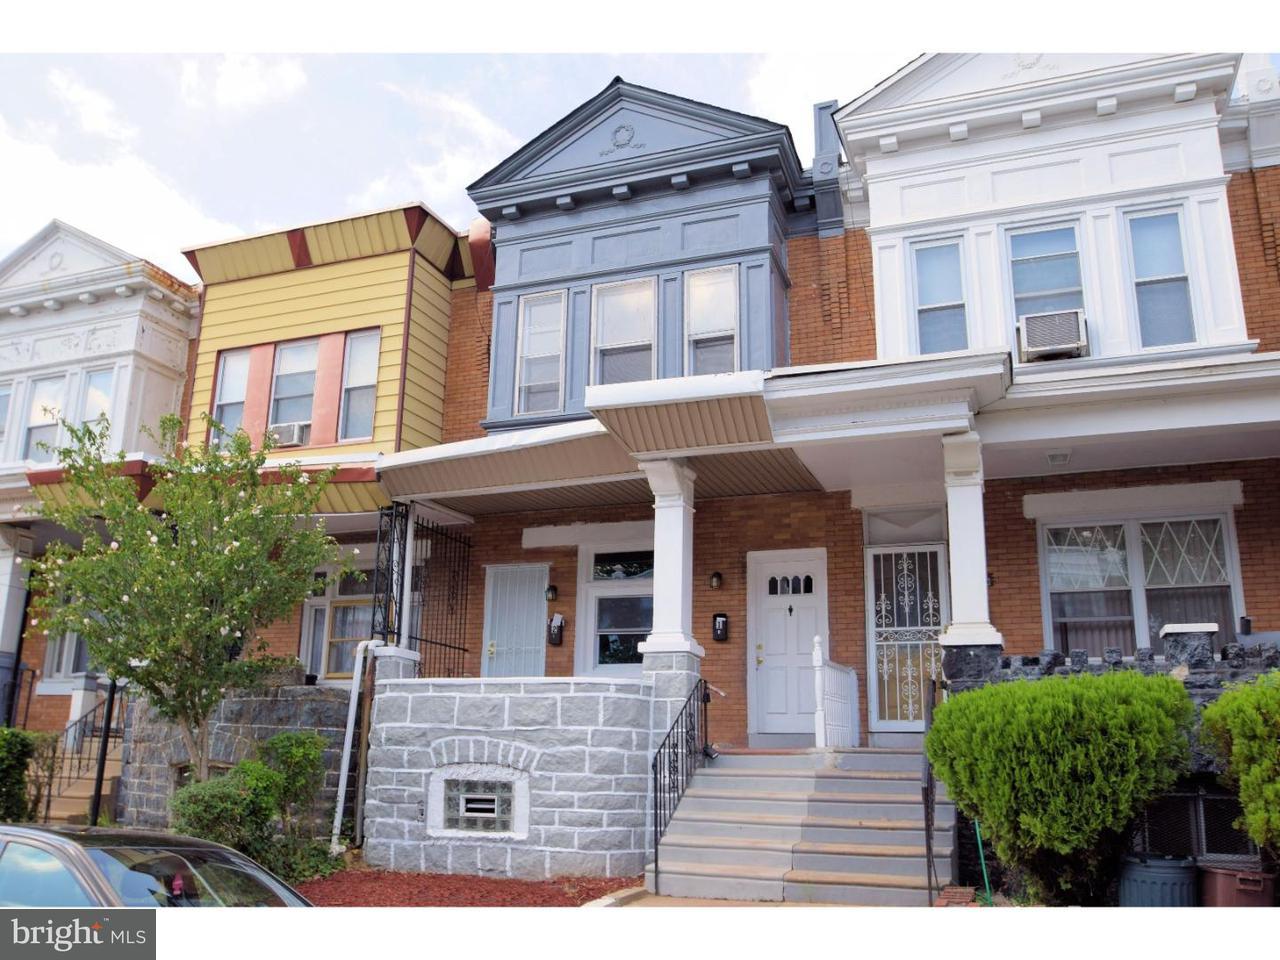 4938 N Warnock Philadelphia, PA 19141